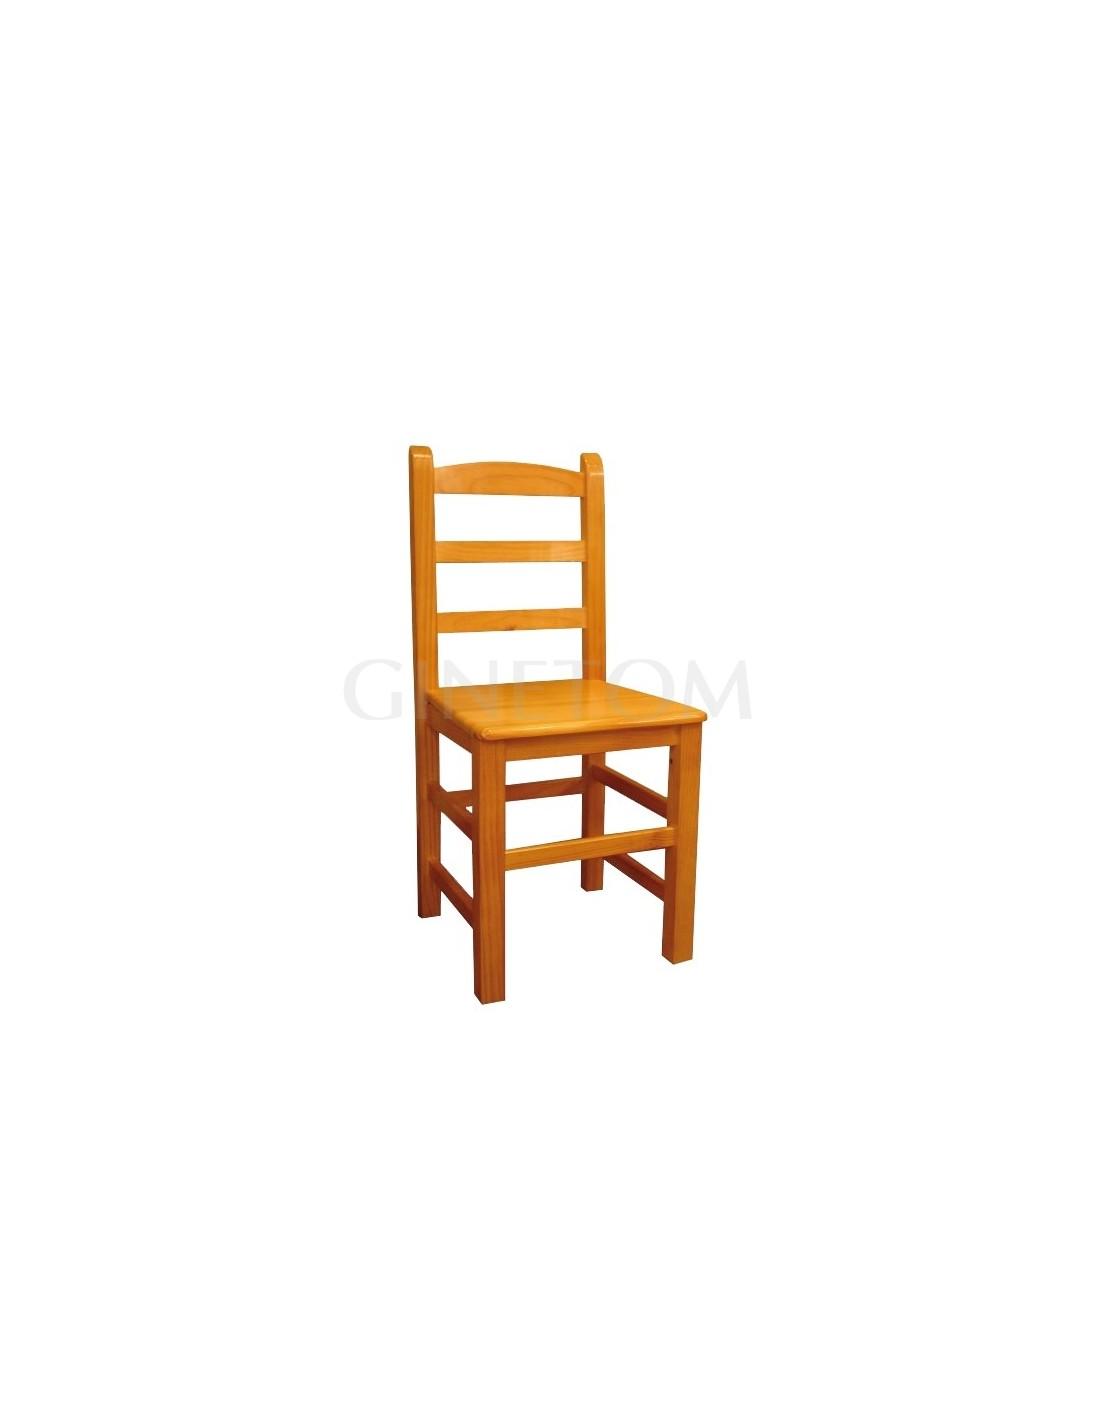 Sillas de madera ref 140 sillas hosteler a de ginetom for Sillas hosteleria